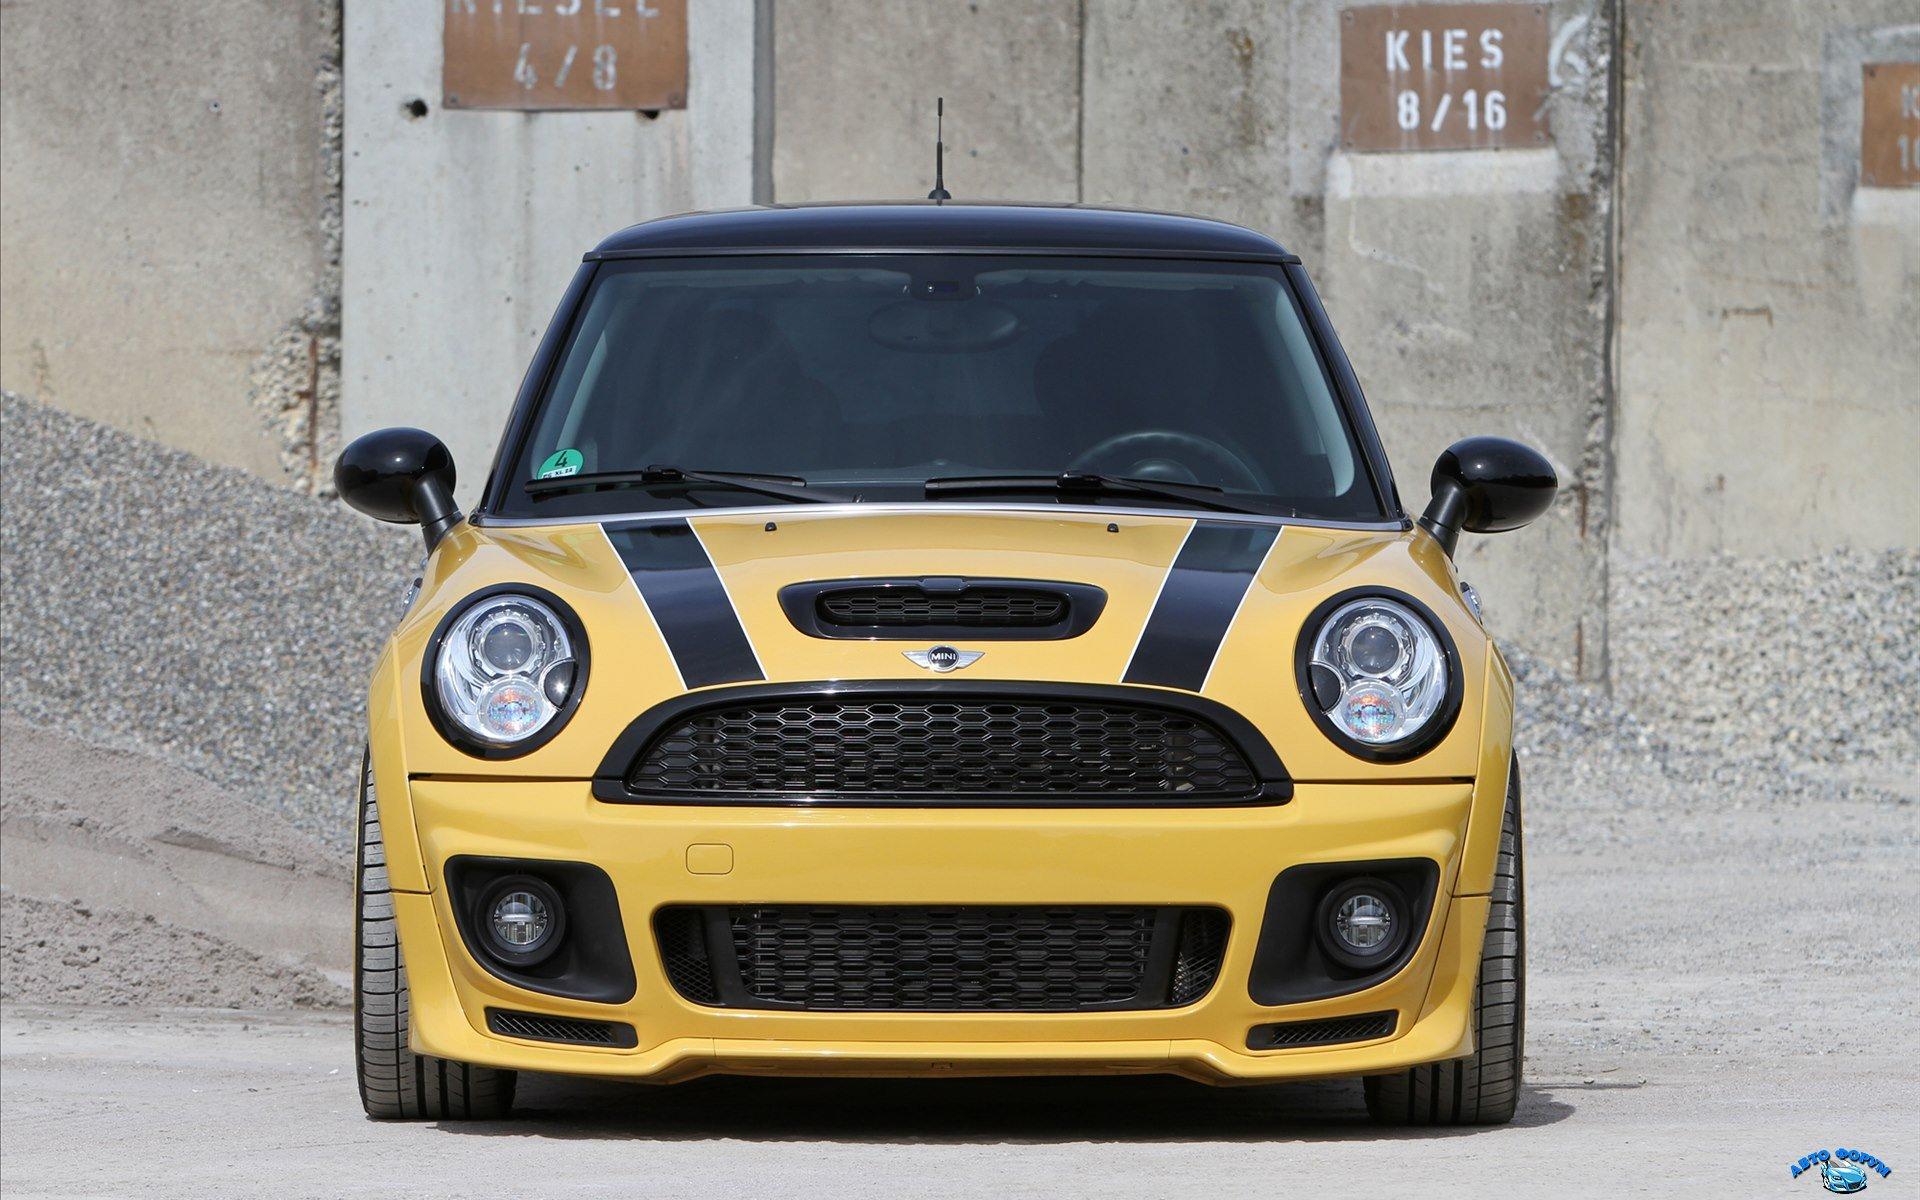 Minitune-MINI-Cooper-S-R56-2014-widescreen-02.jpg